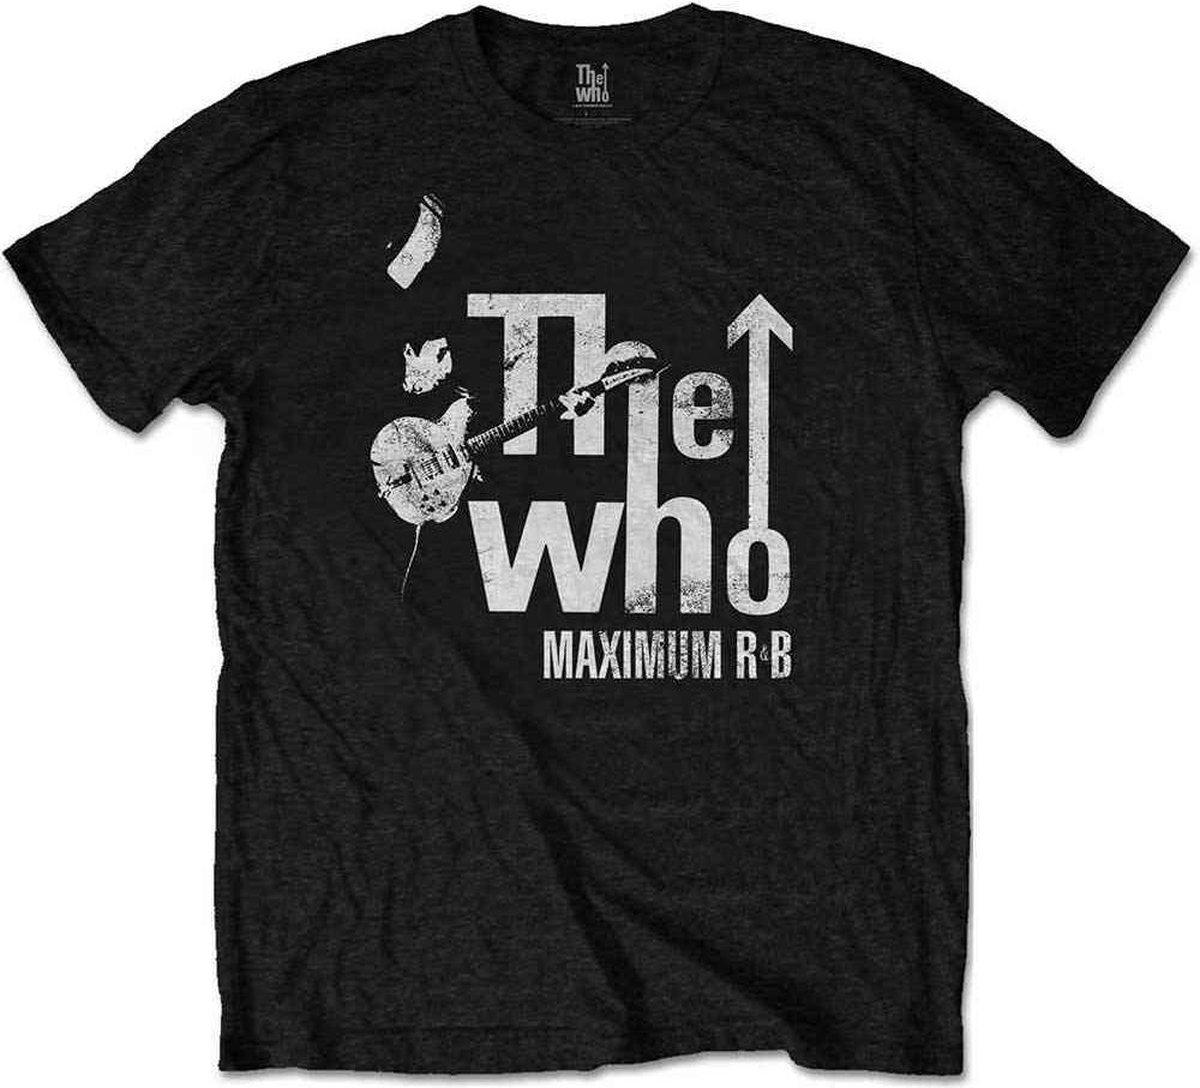 The Who Heren Tshirt -2XL- Maximum R&B Zwart